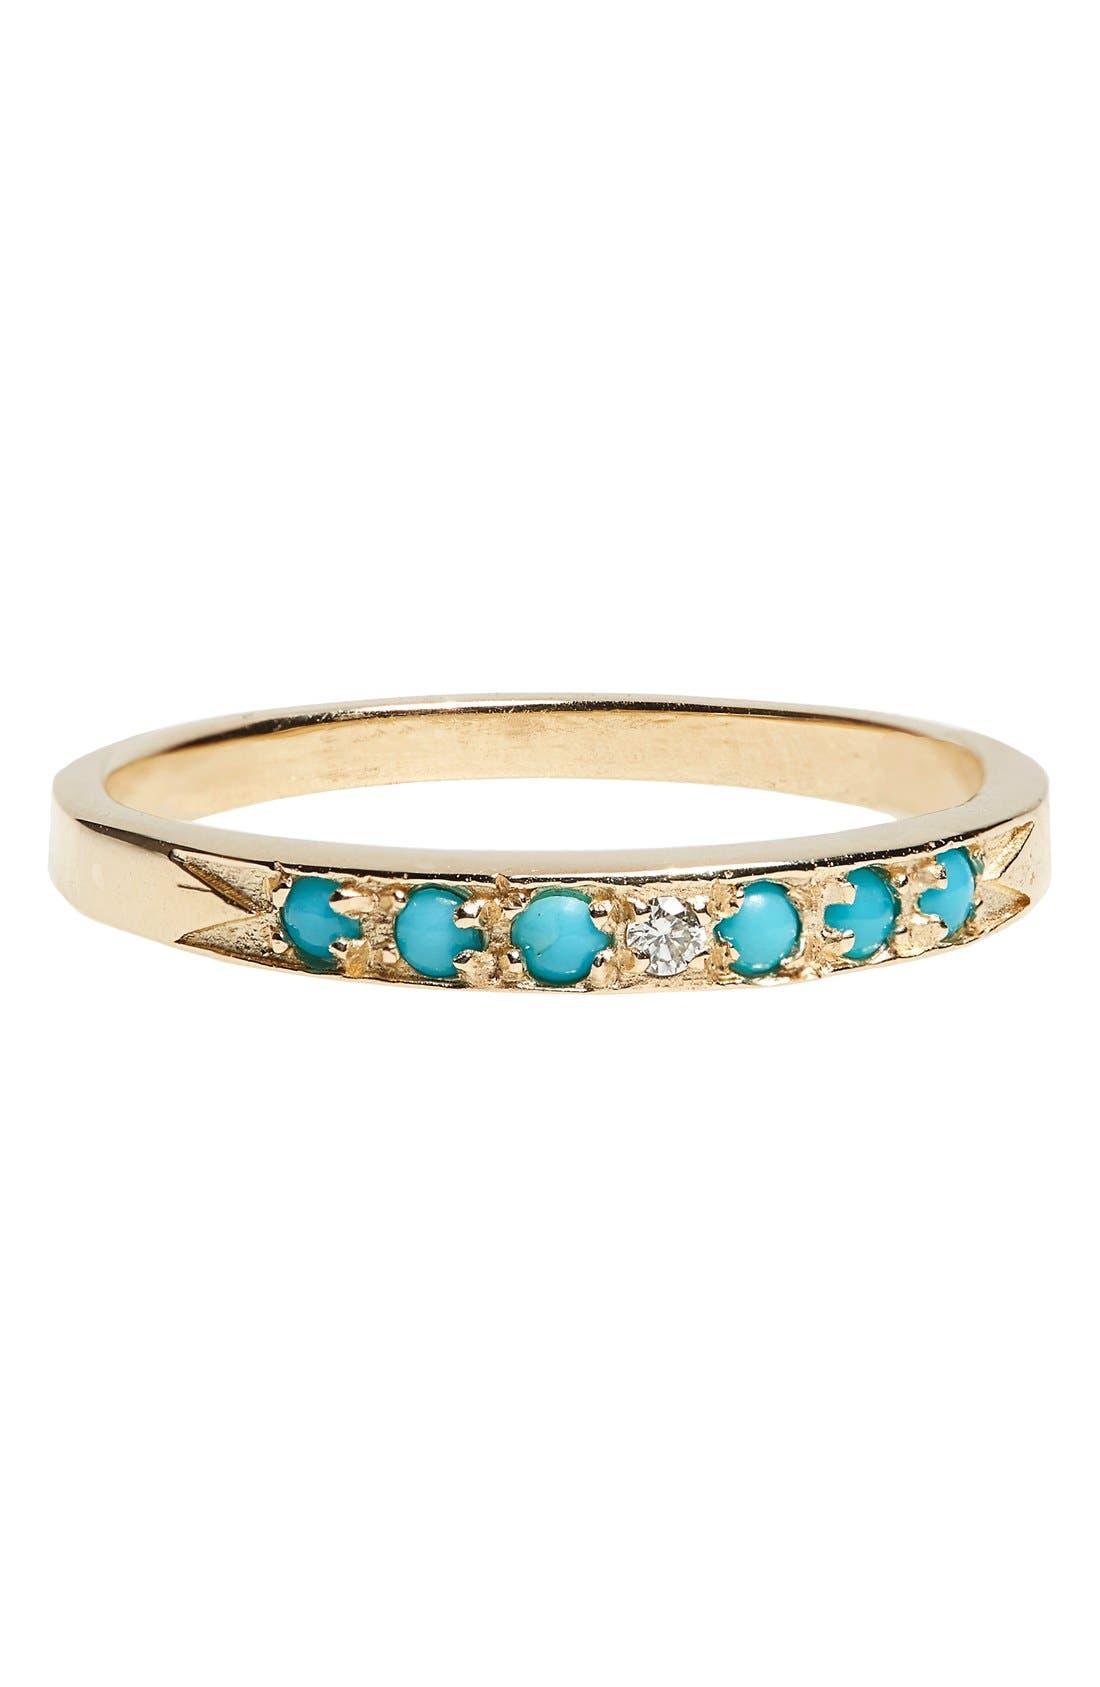 'Moon & Stars' Single Band Turquoise & Diamond Ring,                             Main thumbnail 1, color,